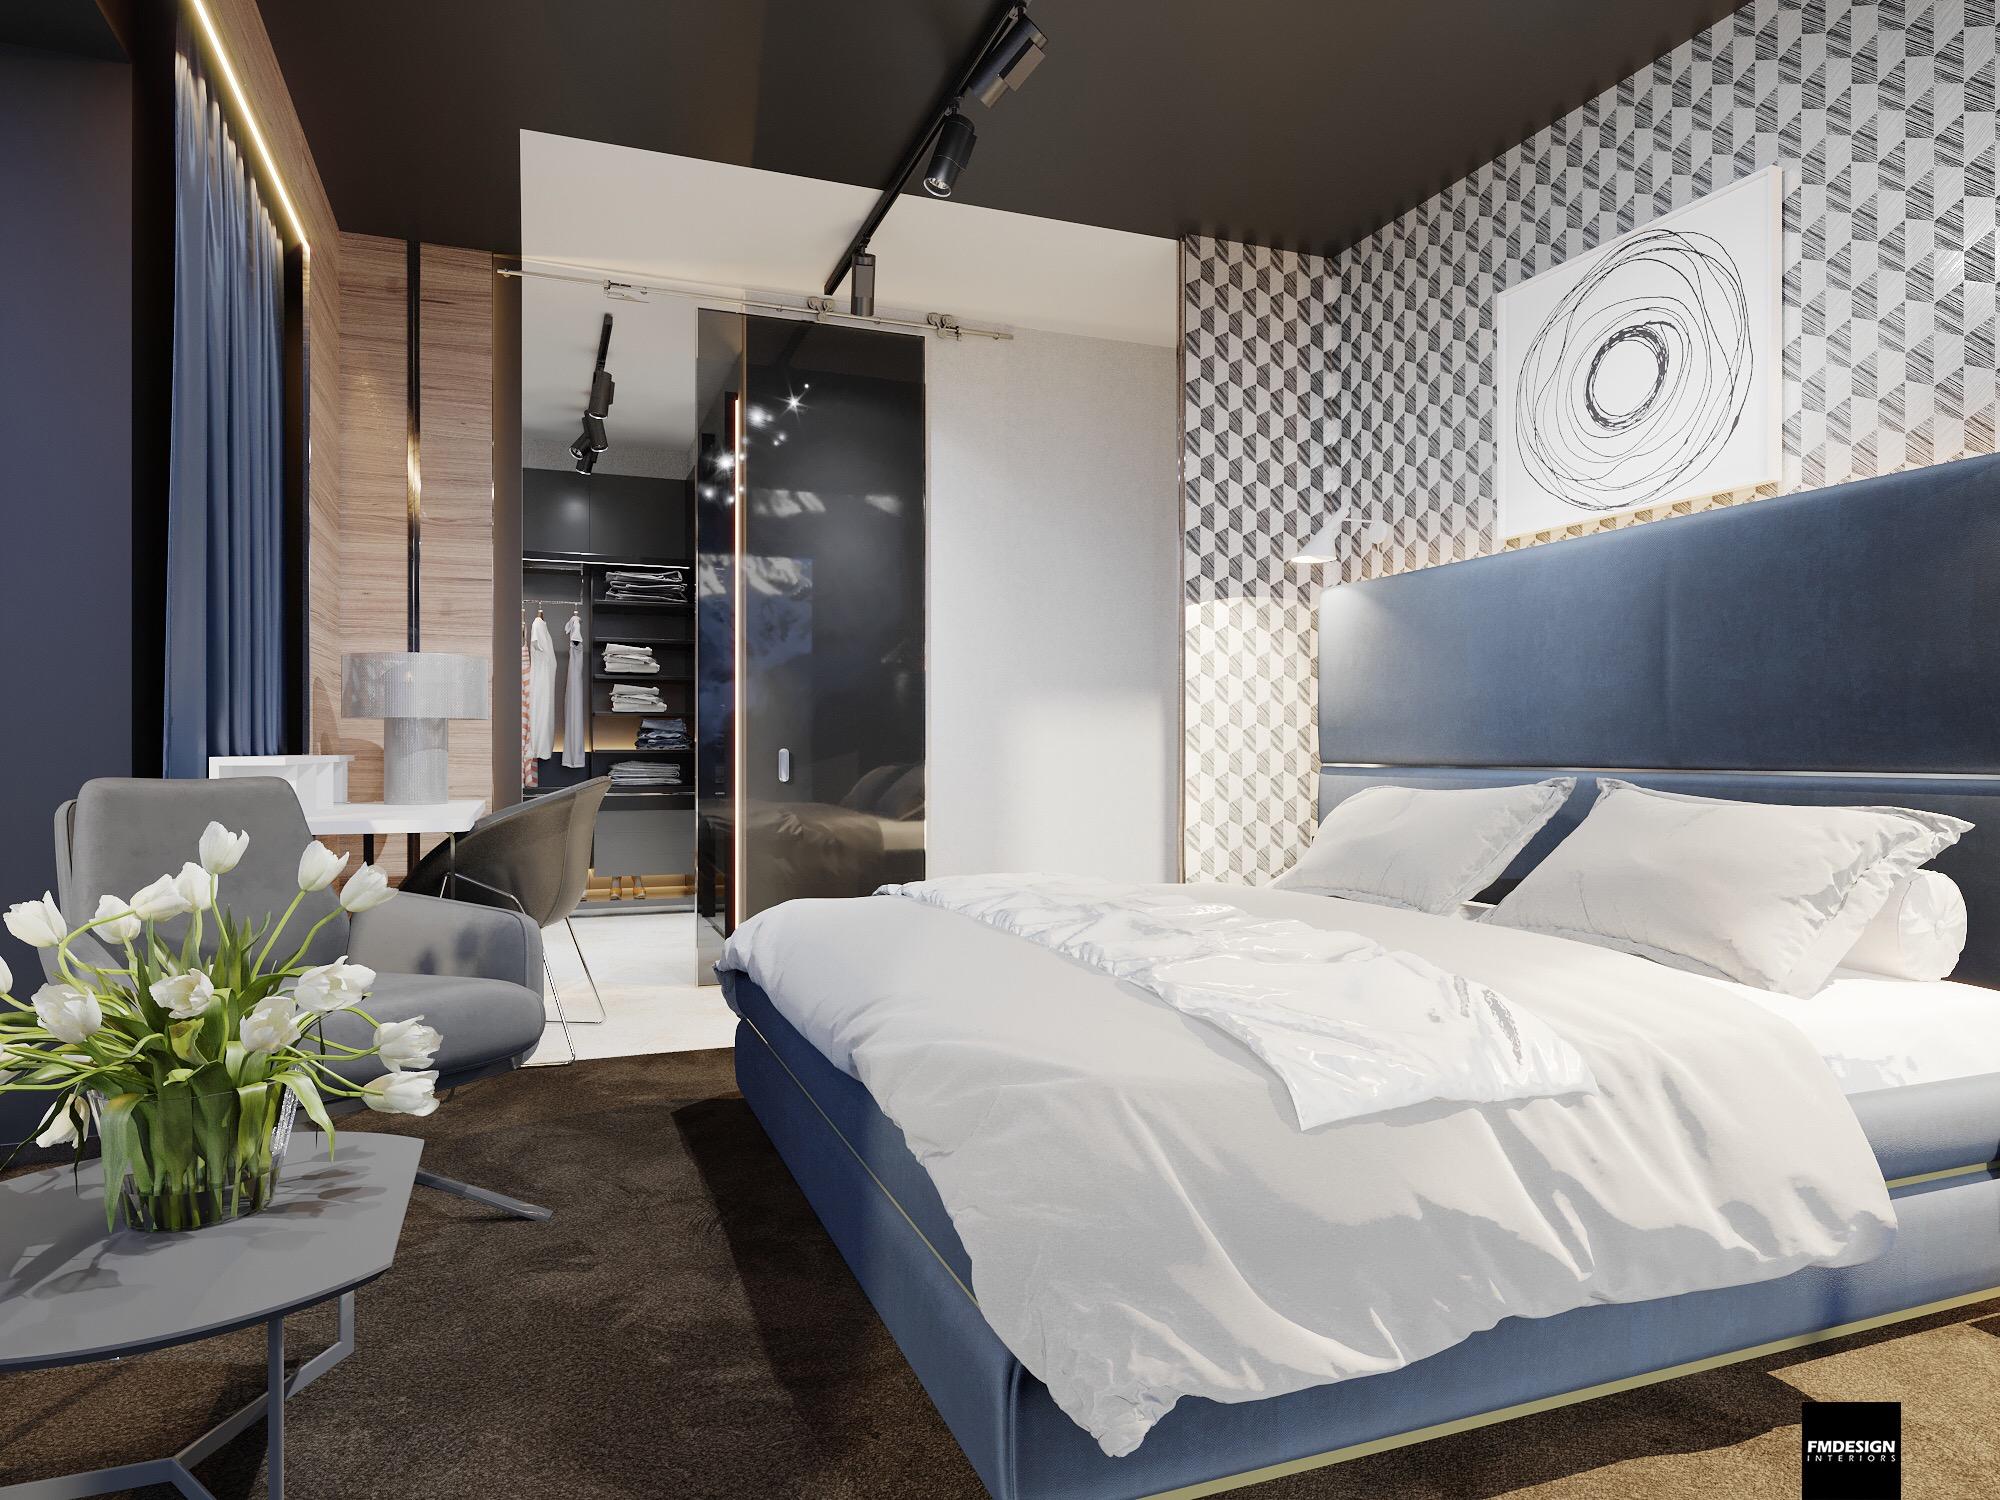 dizajn apartmanu hotelovy nabytok (13)